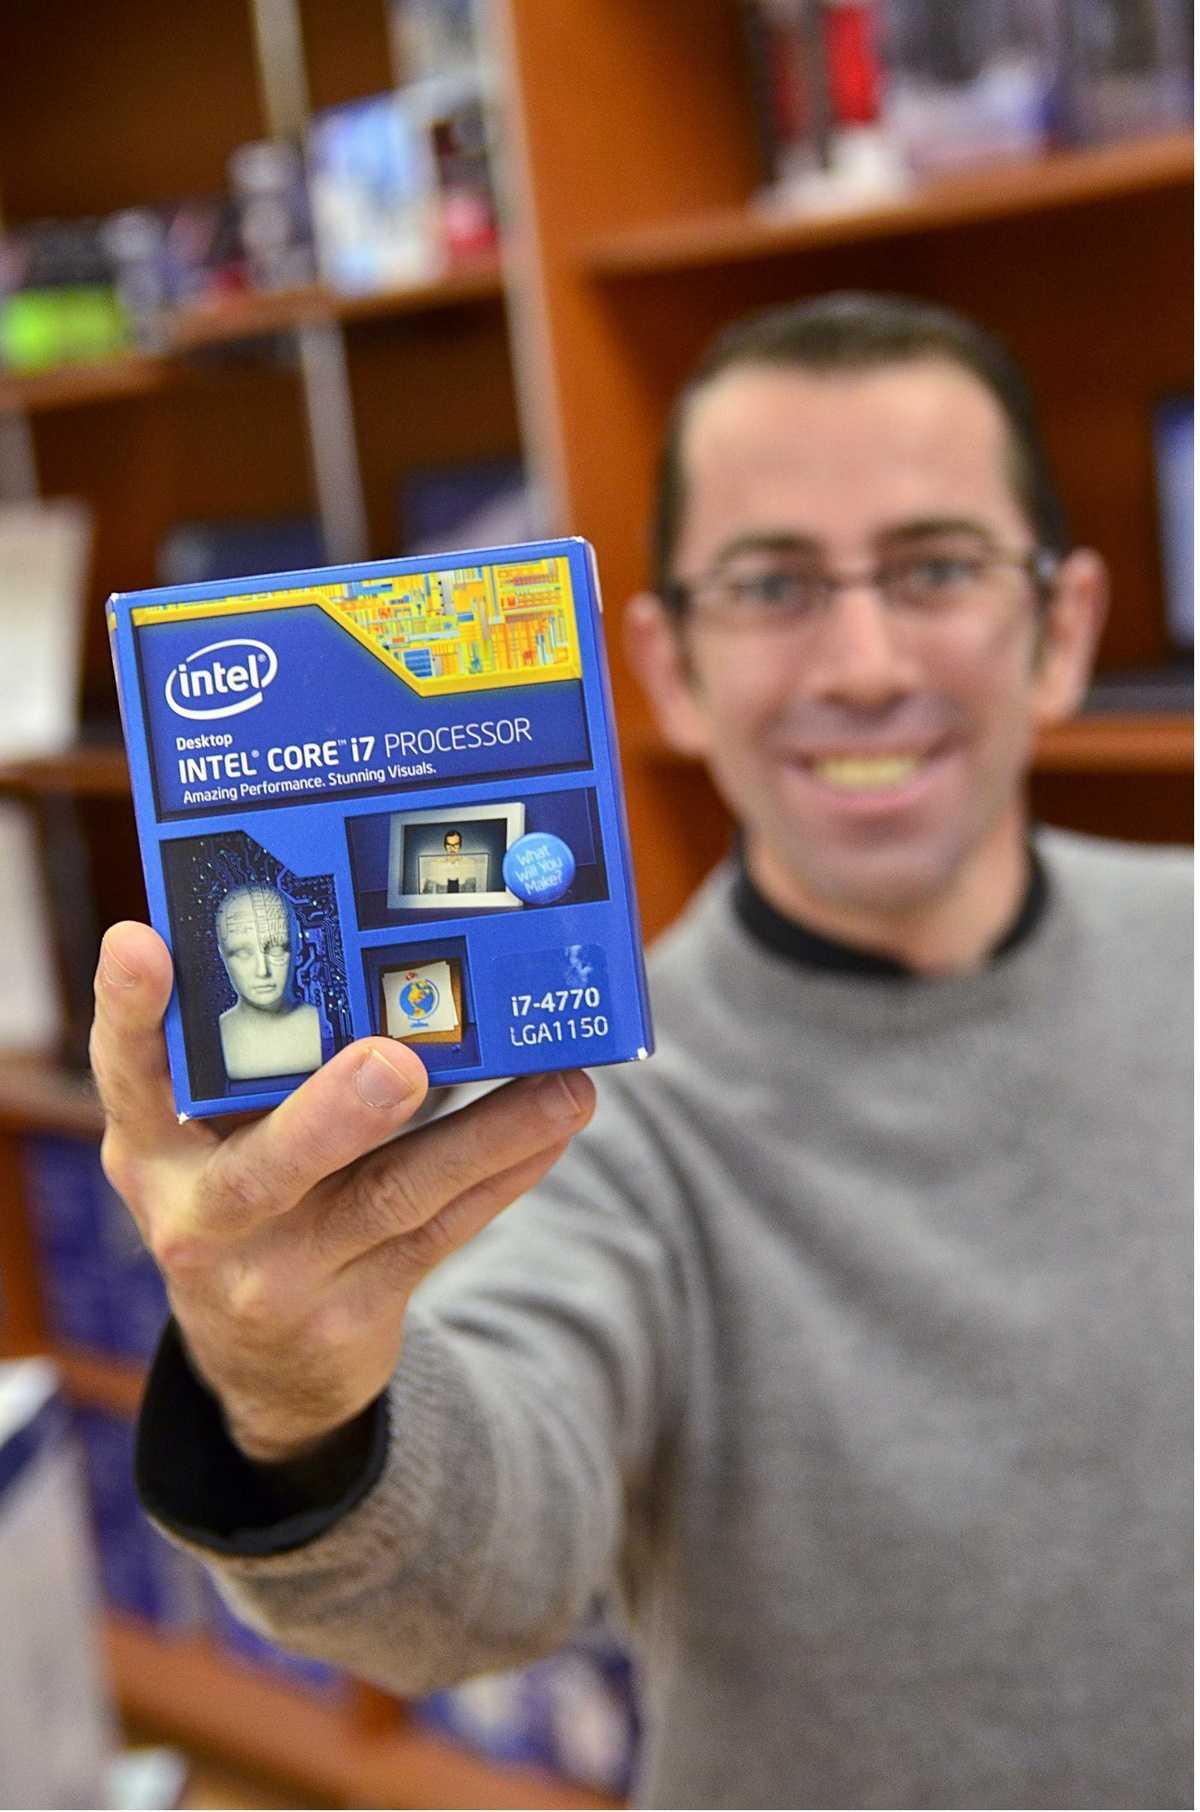 un micro processeur 4 coeurs : intel core 7 pocessor